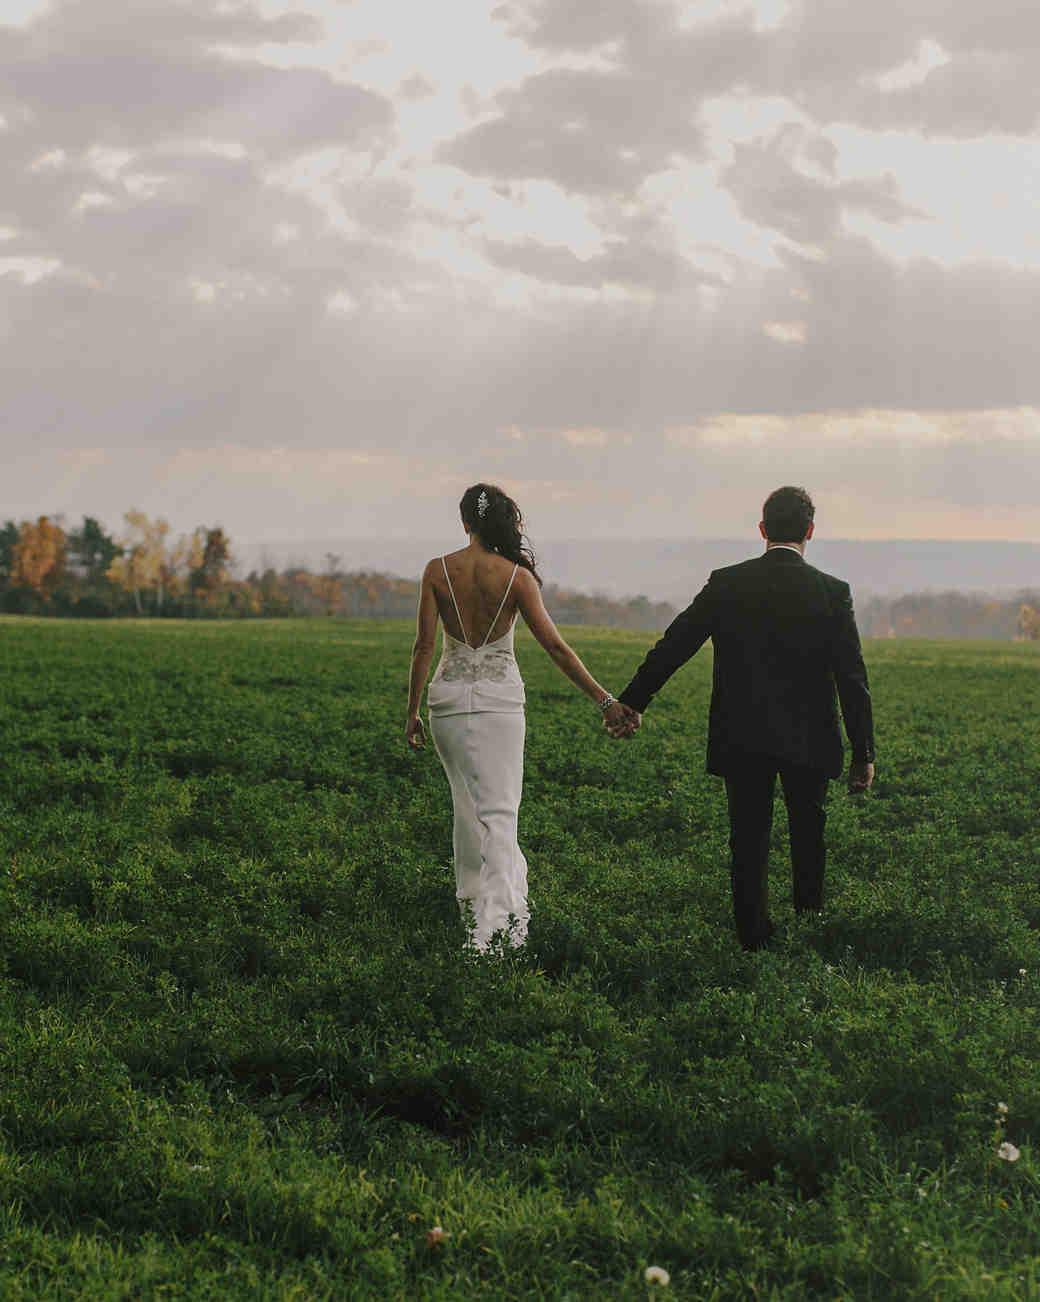 rosie-constantine-wedding-couple-401-s112177-1015.jpg